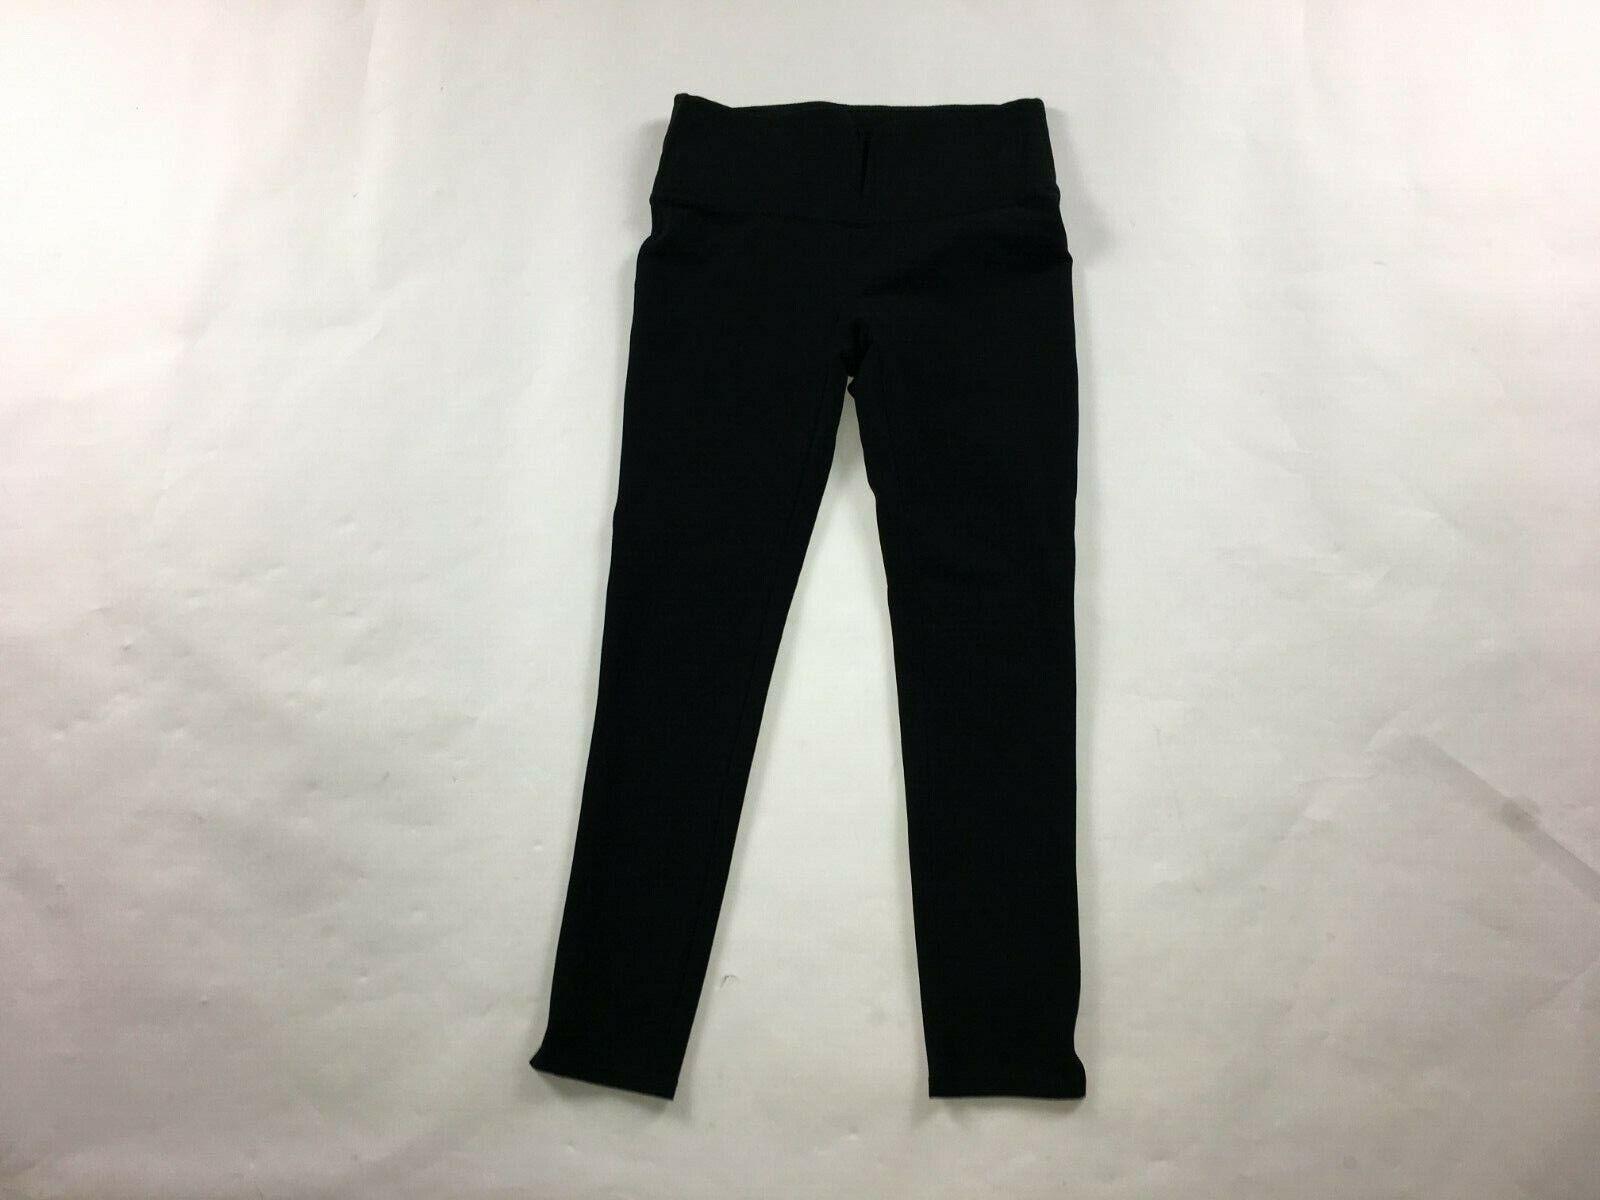 Women s Ready To Wow Spanx Yoga Pants Size M Medium Black Capri High Waist 789 - $34.99